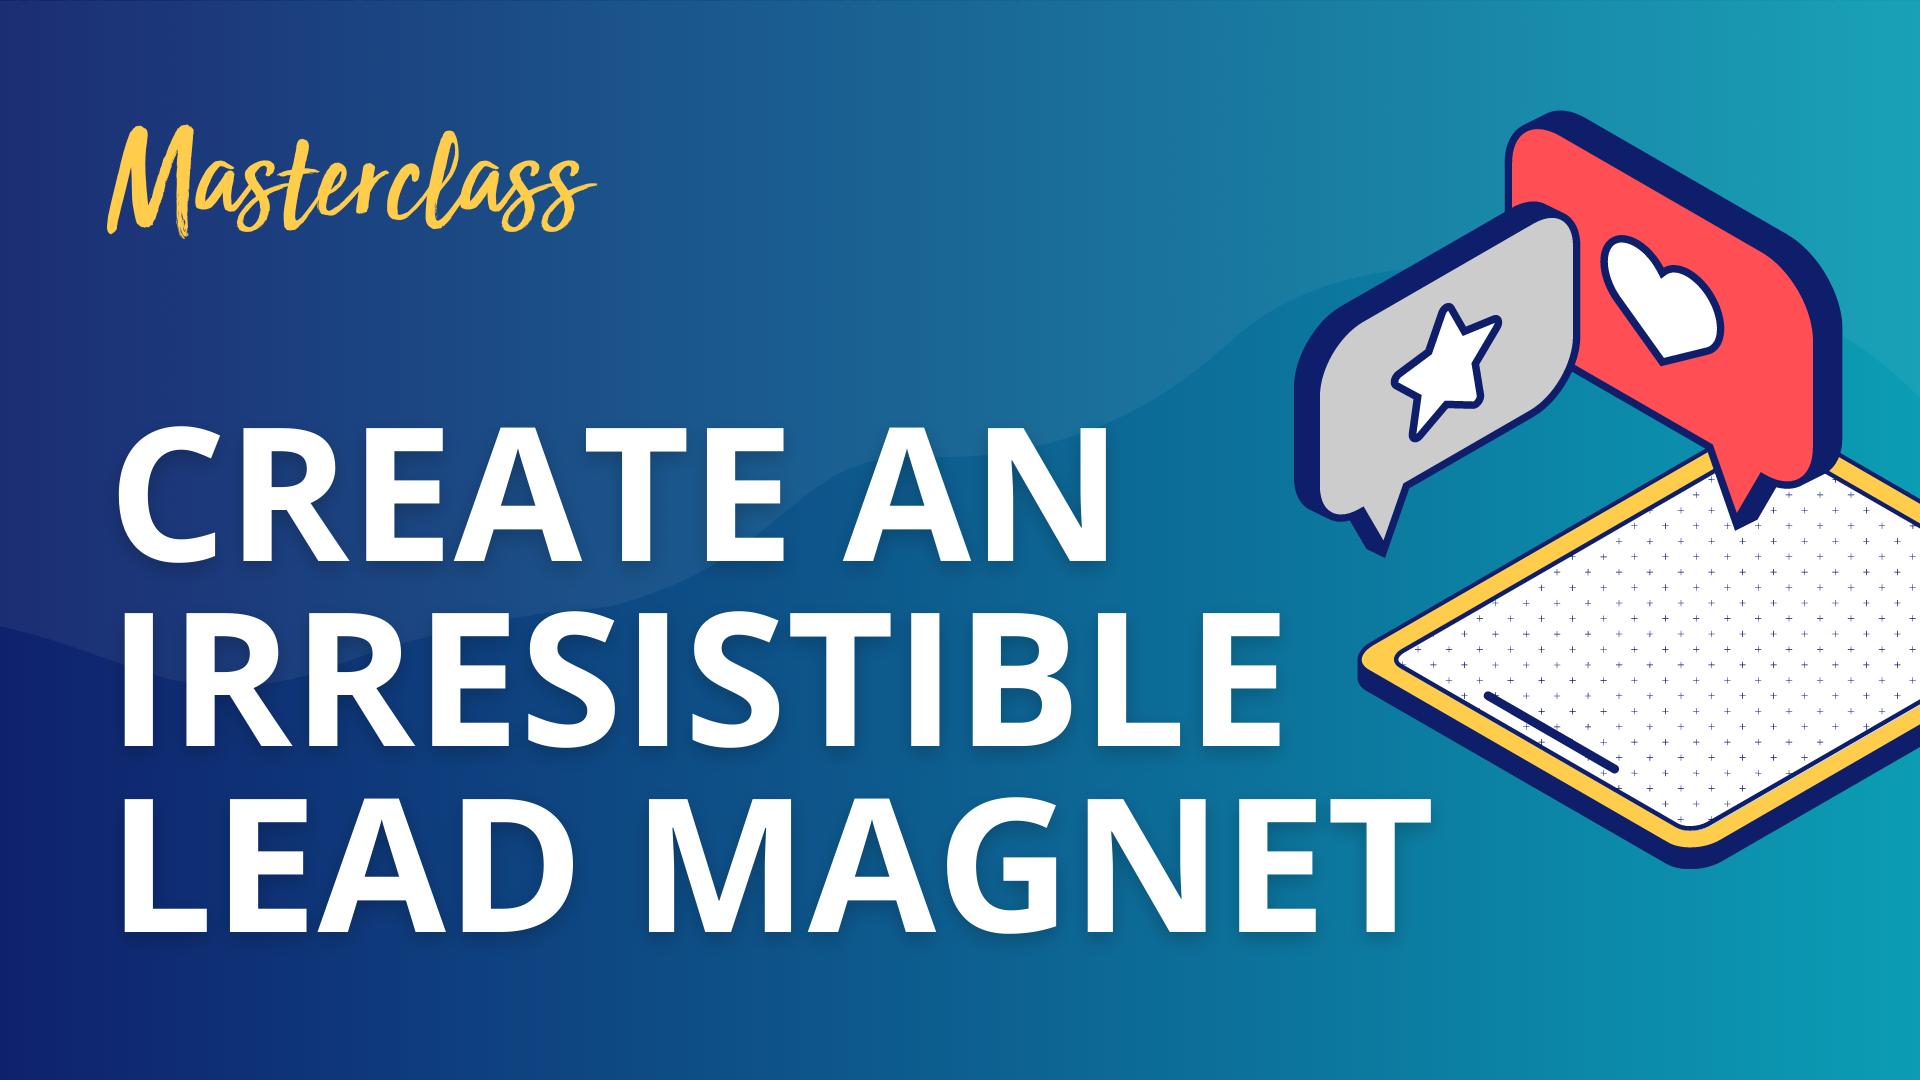 Create An Irresistible Lead Magnet Masterclass by Jessica Osborn